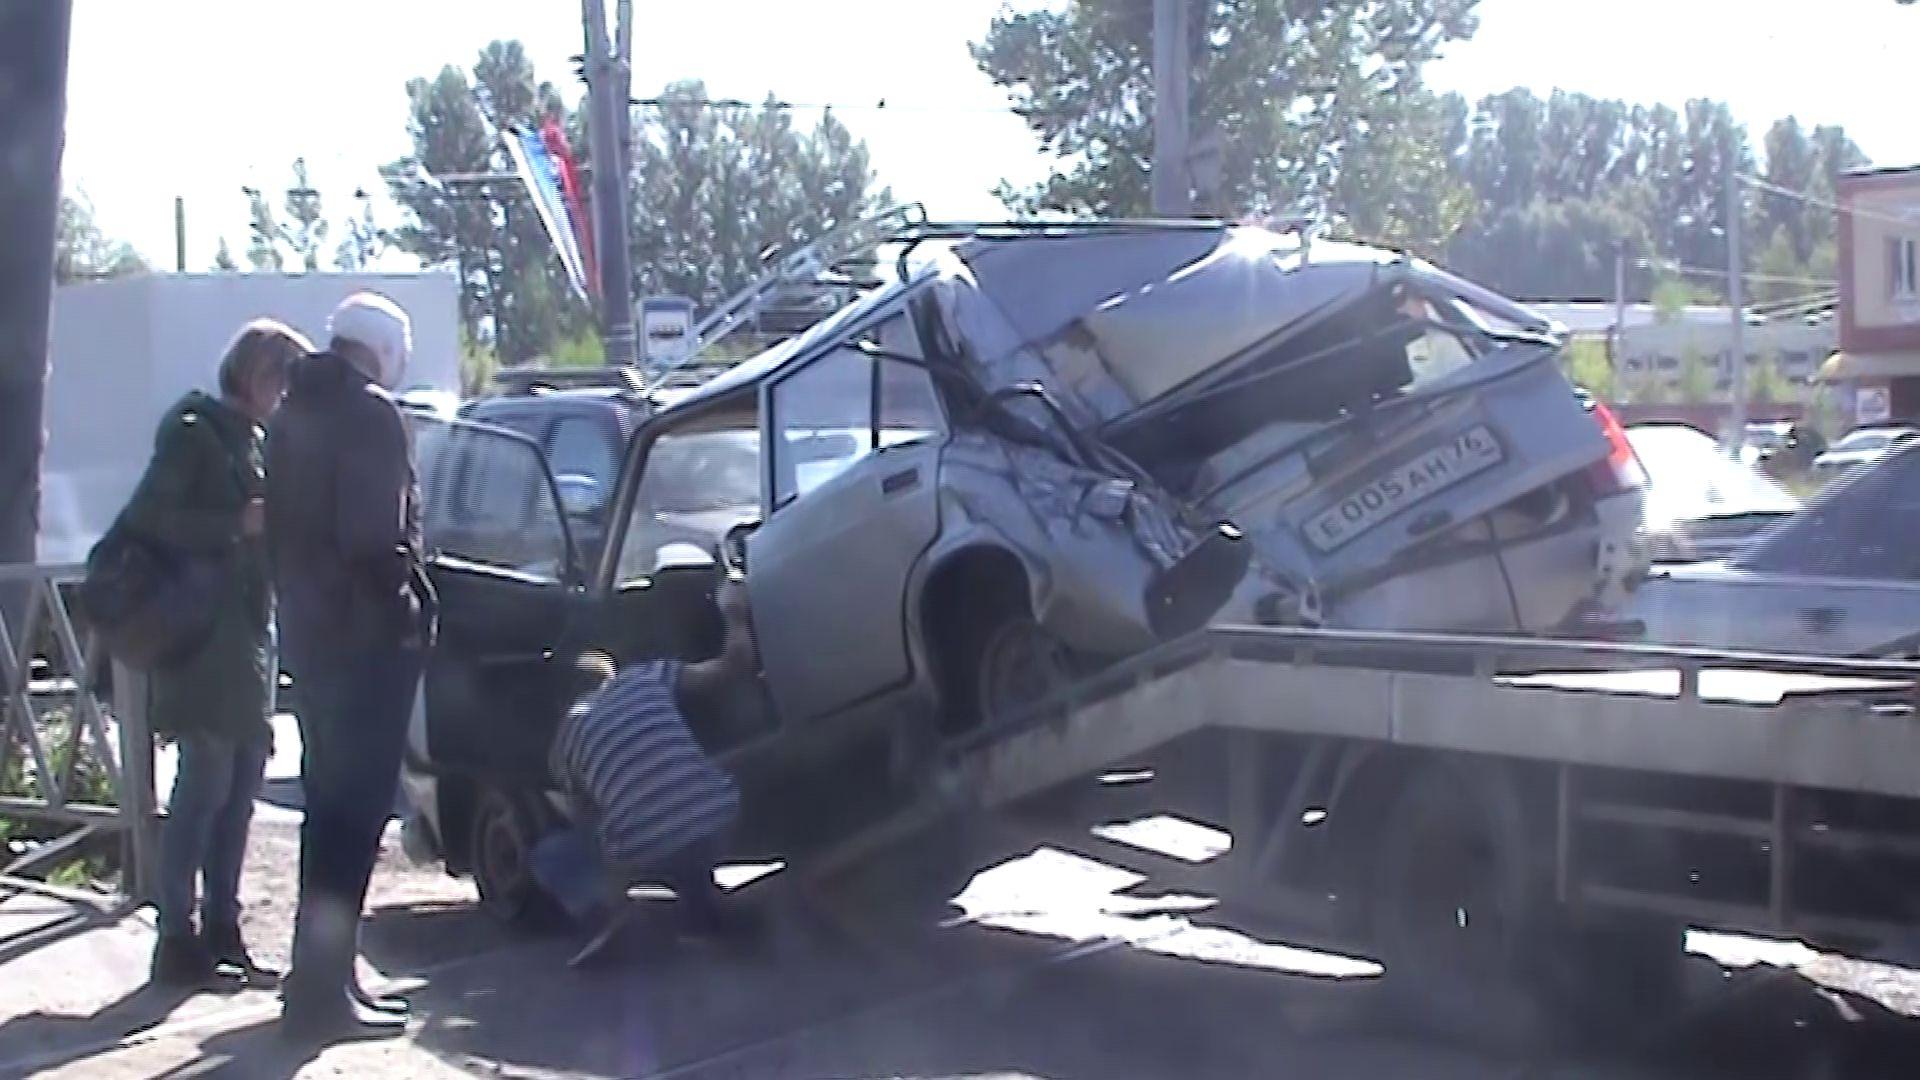 В ДТП на Ленинградском проспекте грузовик смял легковушку